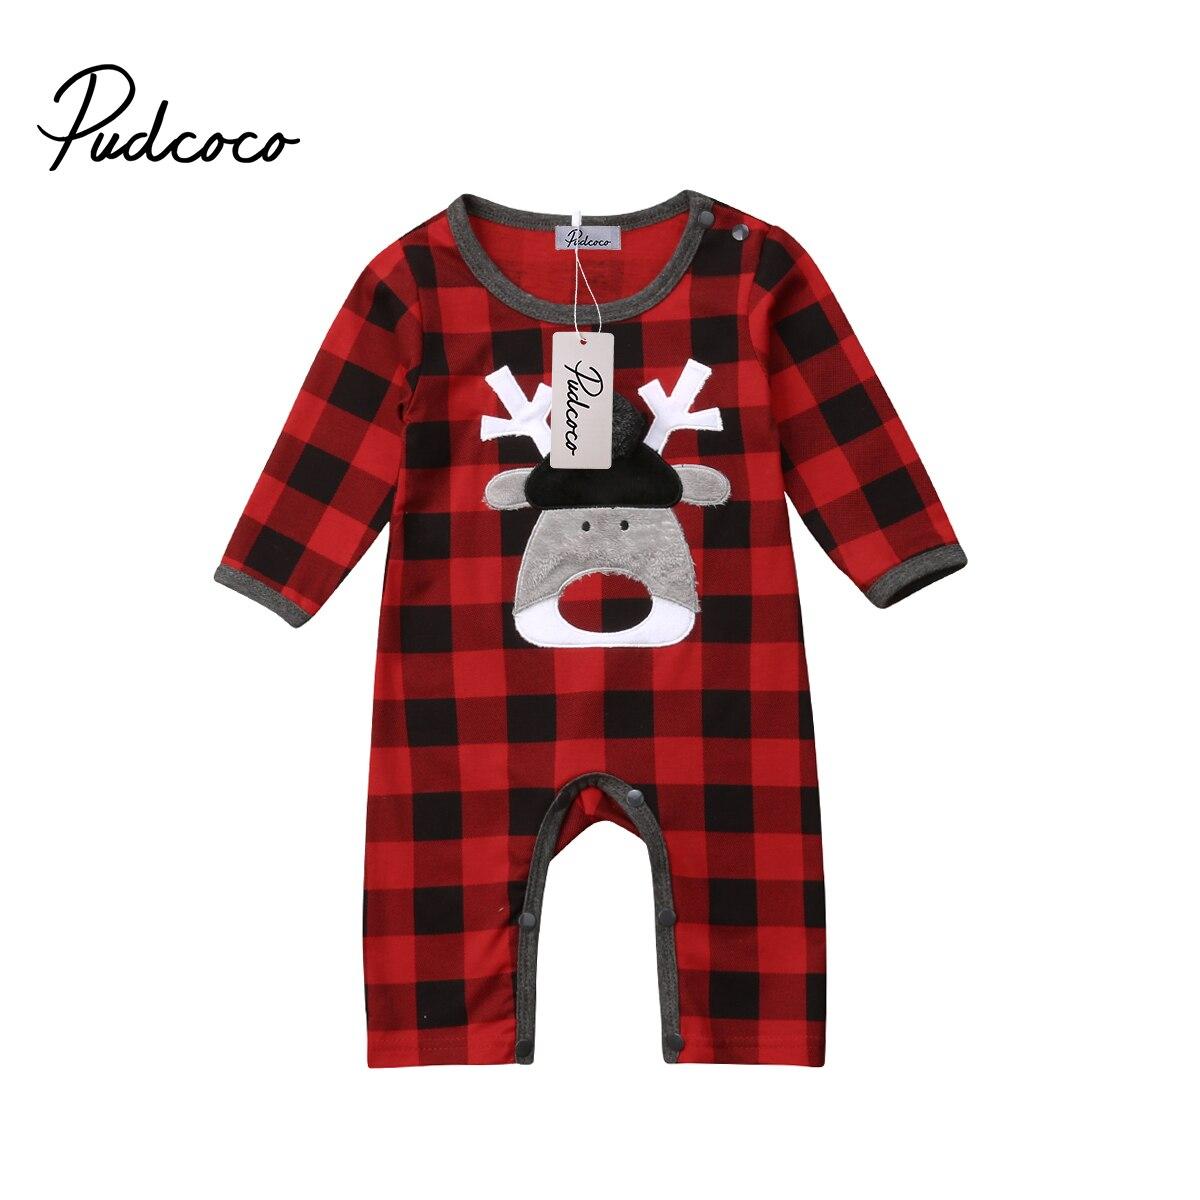 7c5332866f96 Newborn Baby Girls Boy Elk Christmas Romperb Babies One-piece Plaids  Jumpsuit Clothes Outfits 0-18M